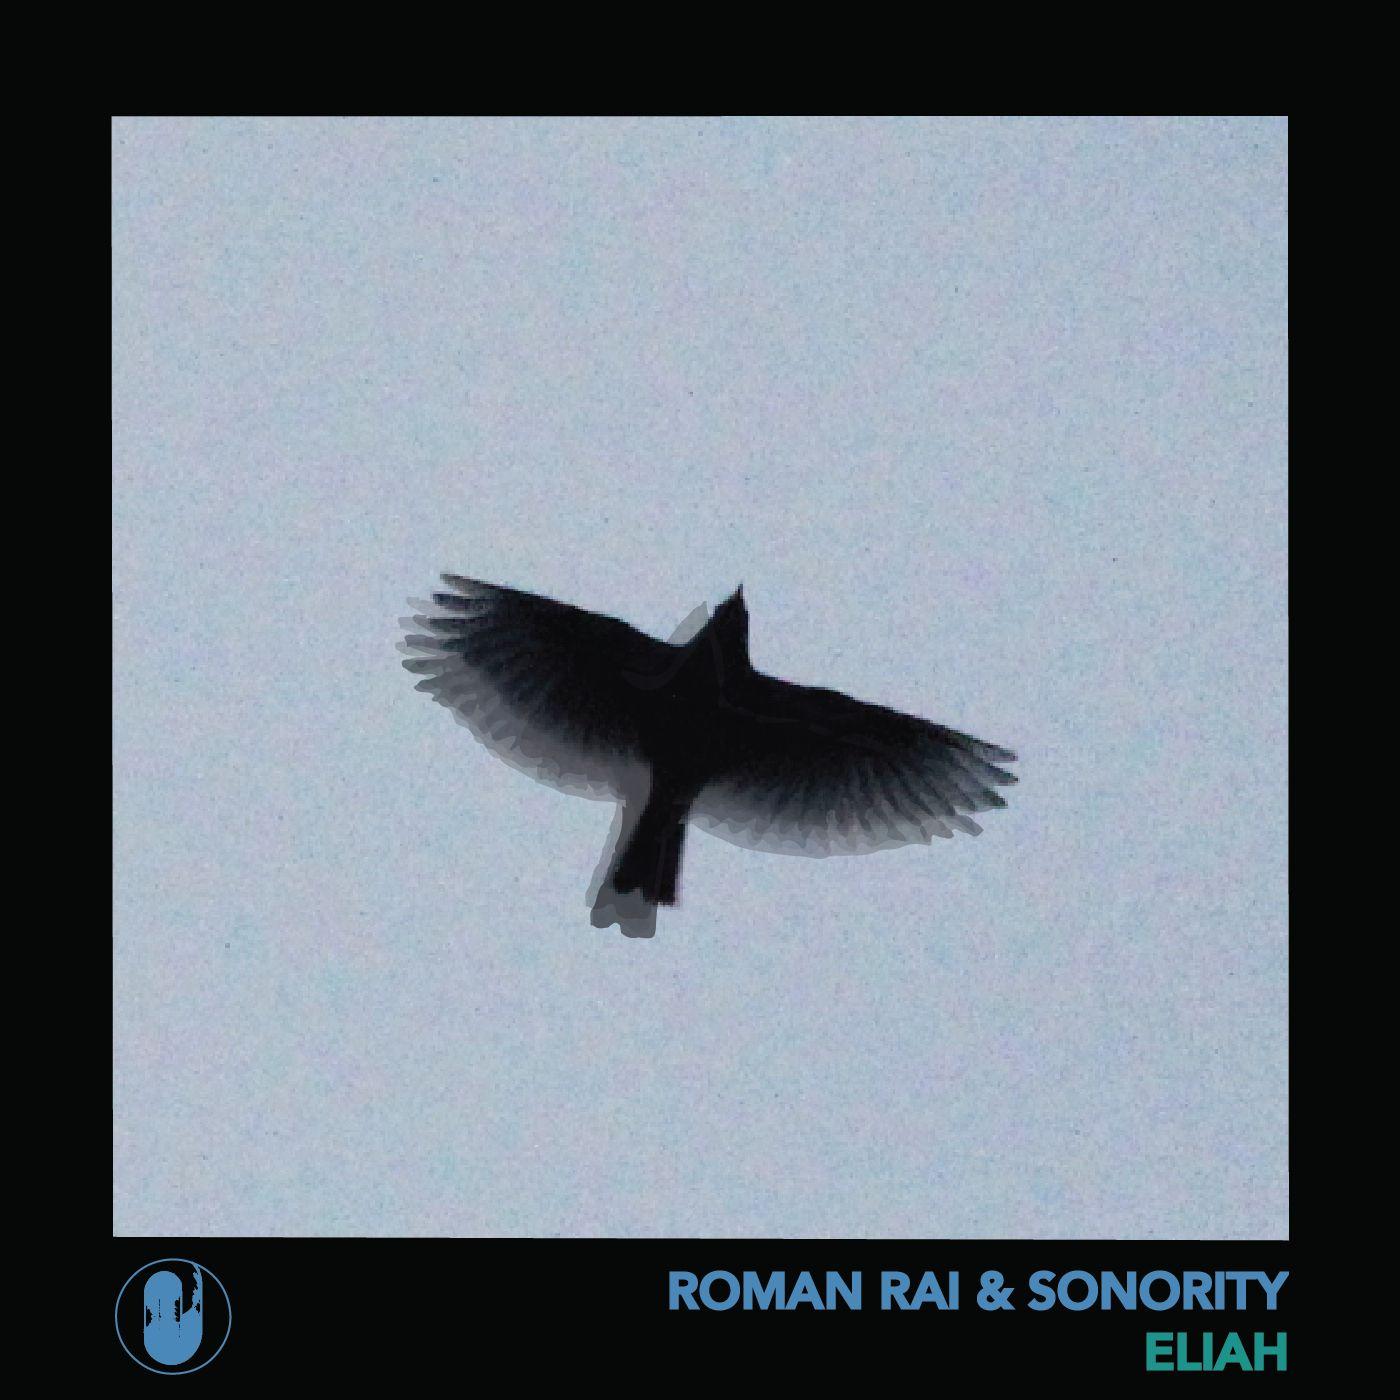 roman_rai_sonority_-_eliah_1_new.jpg